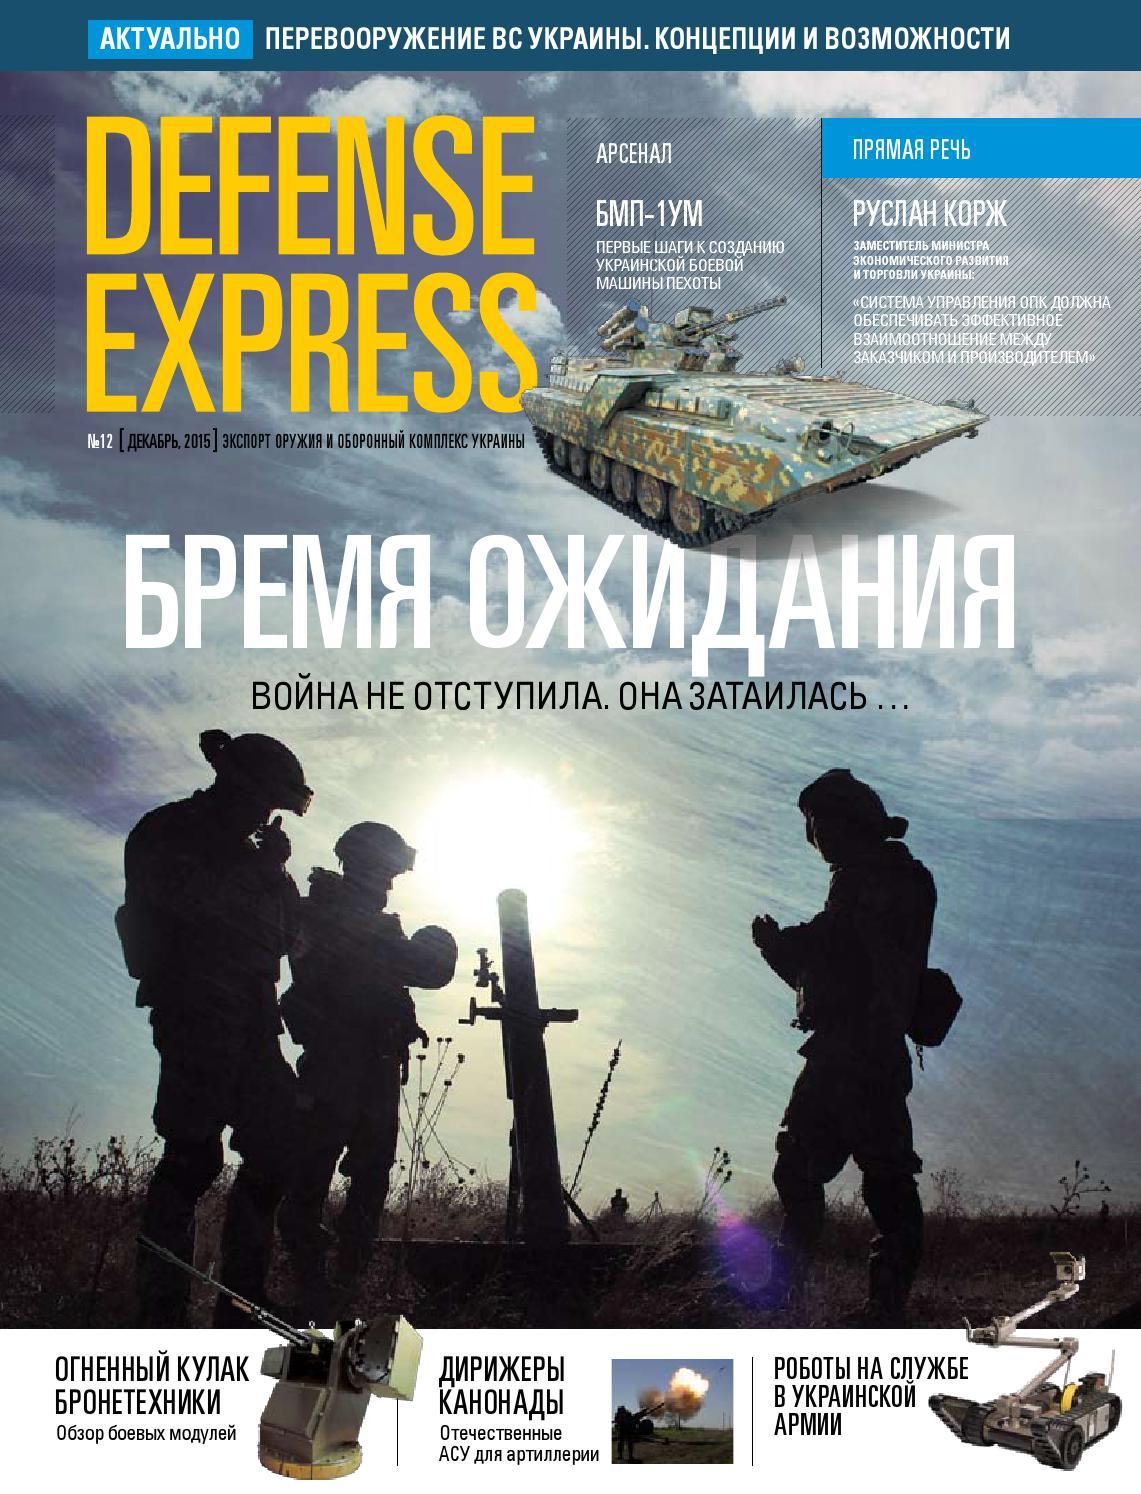 download Грошовi знаки та монети України 2005